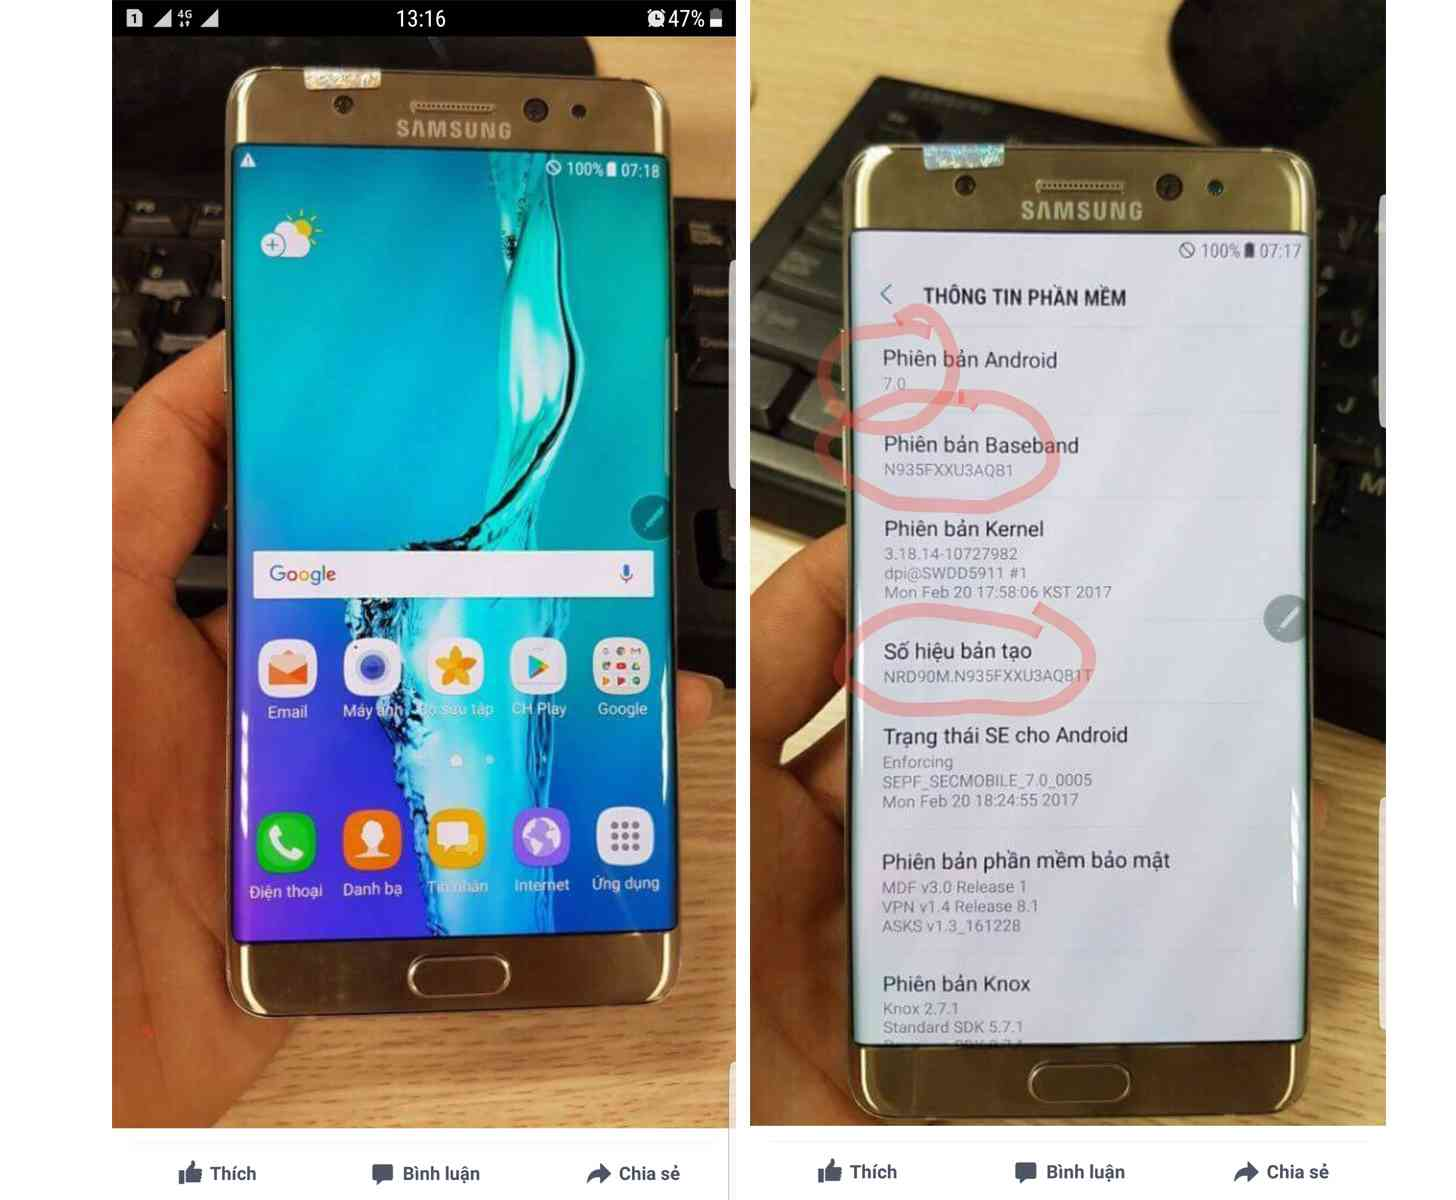 Refurbished Samsung Galaxy Note 7 photos leak